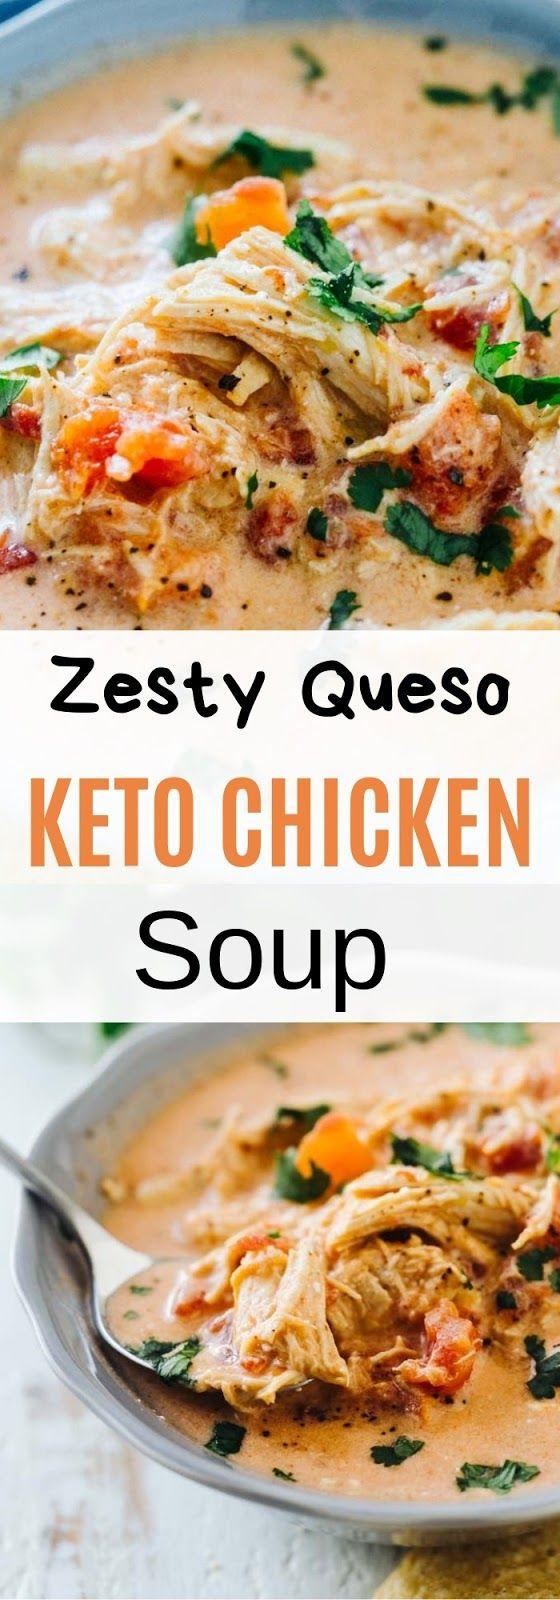 Zesty Queso Keto Chicken Soup Keto Soup Chicken Next